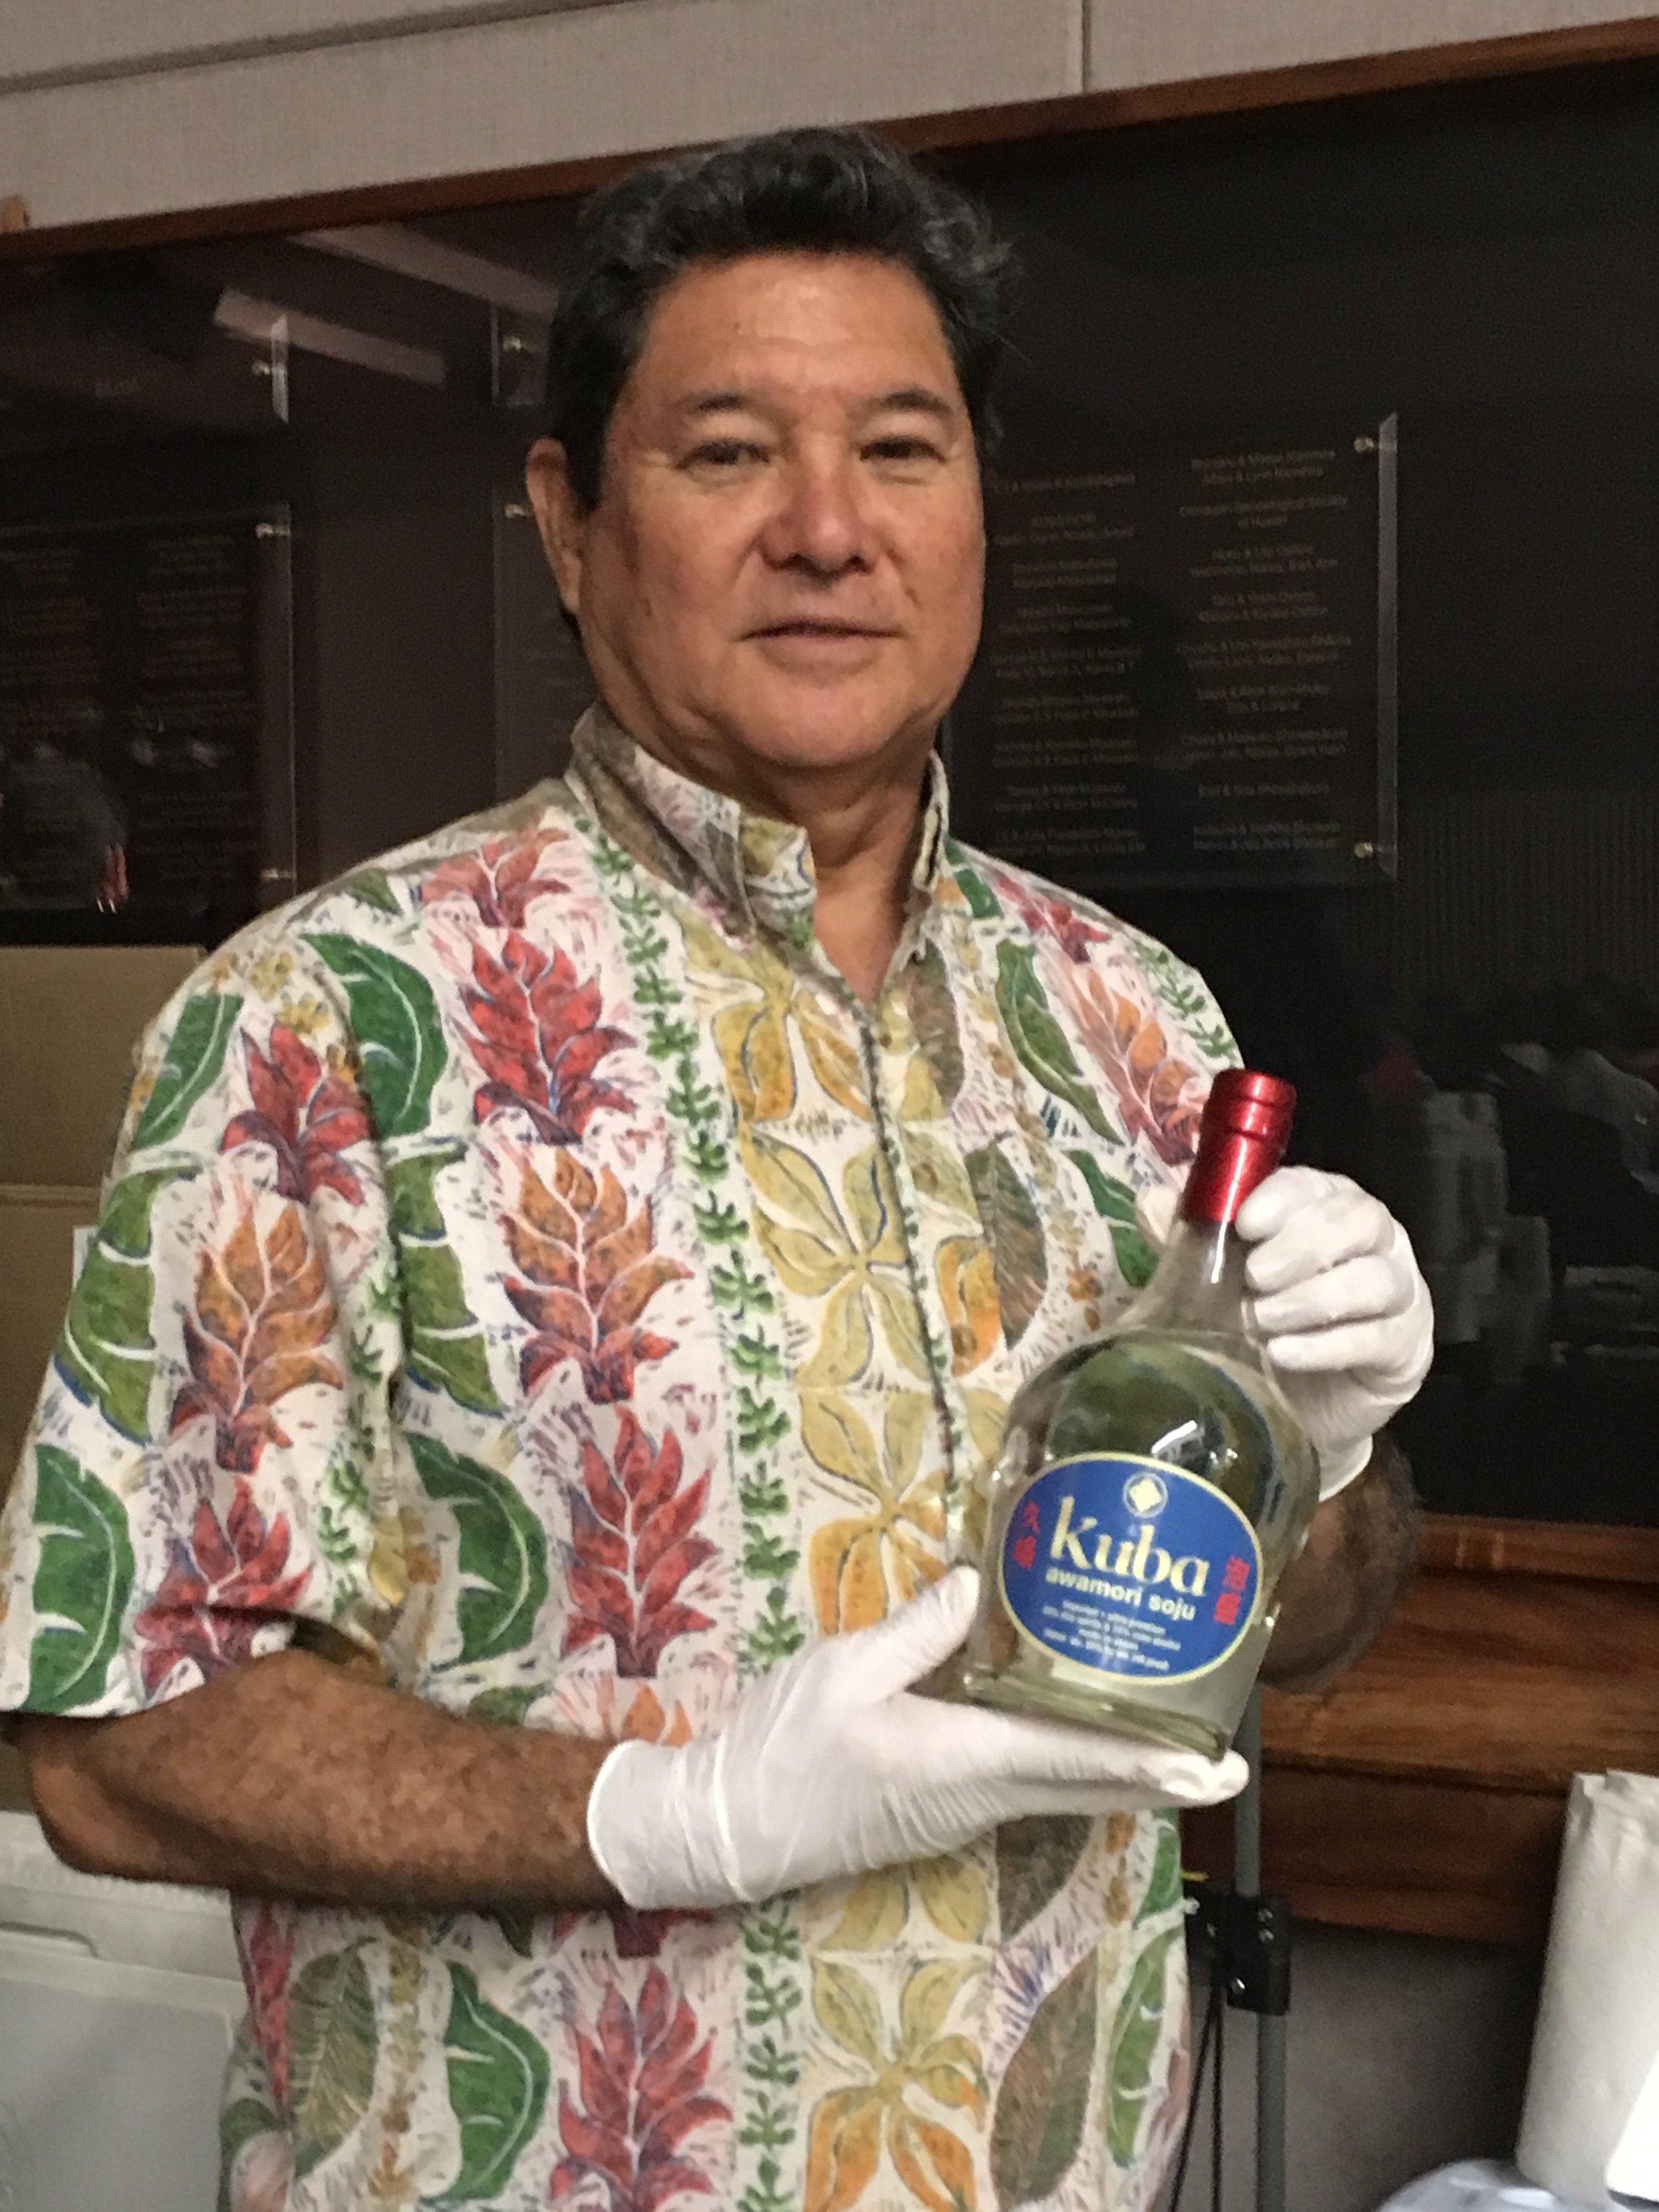 Randy Kuba and his signature Kuba Awamori.